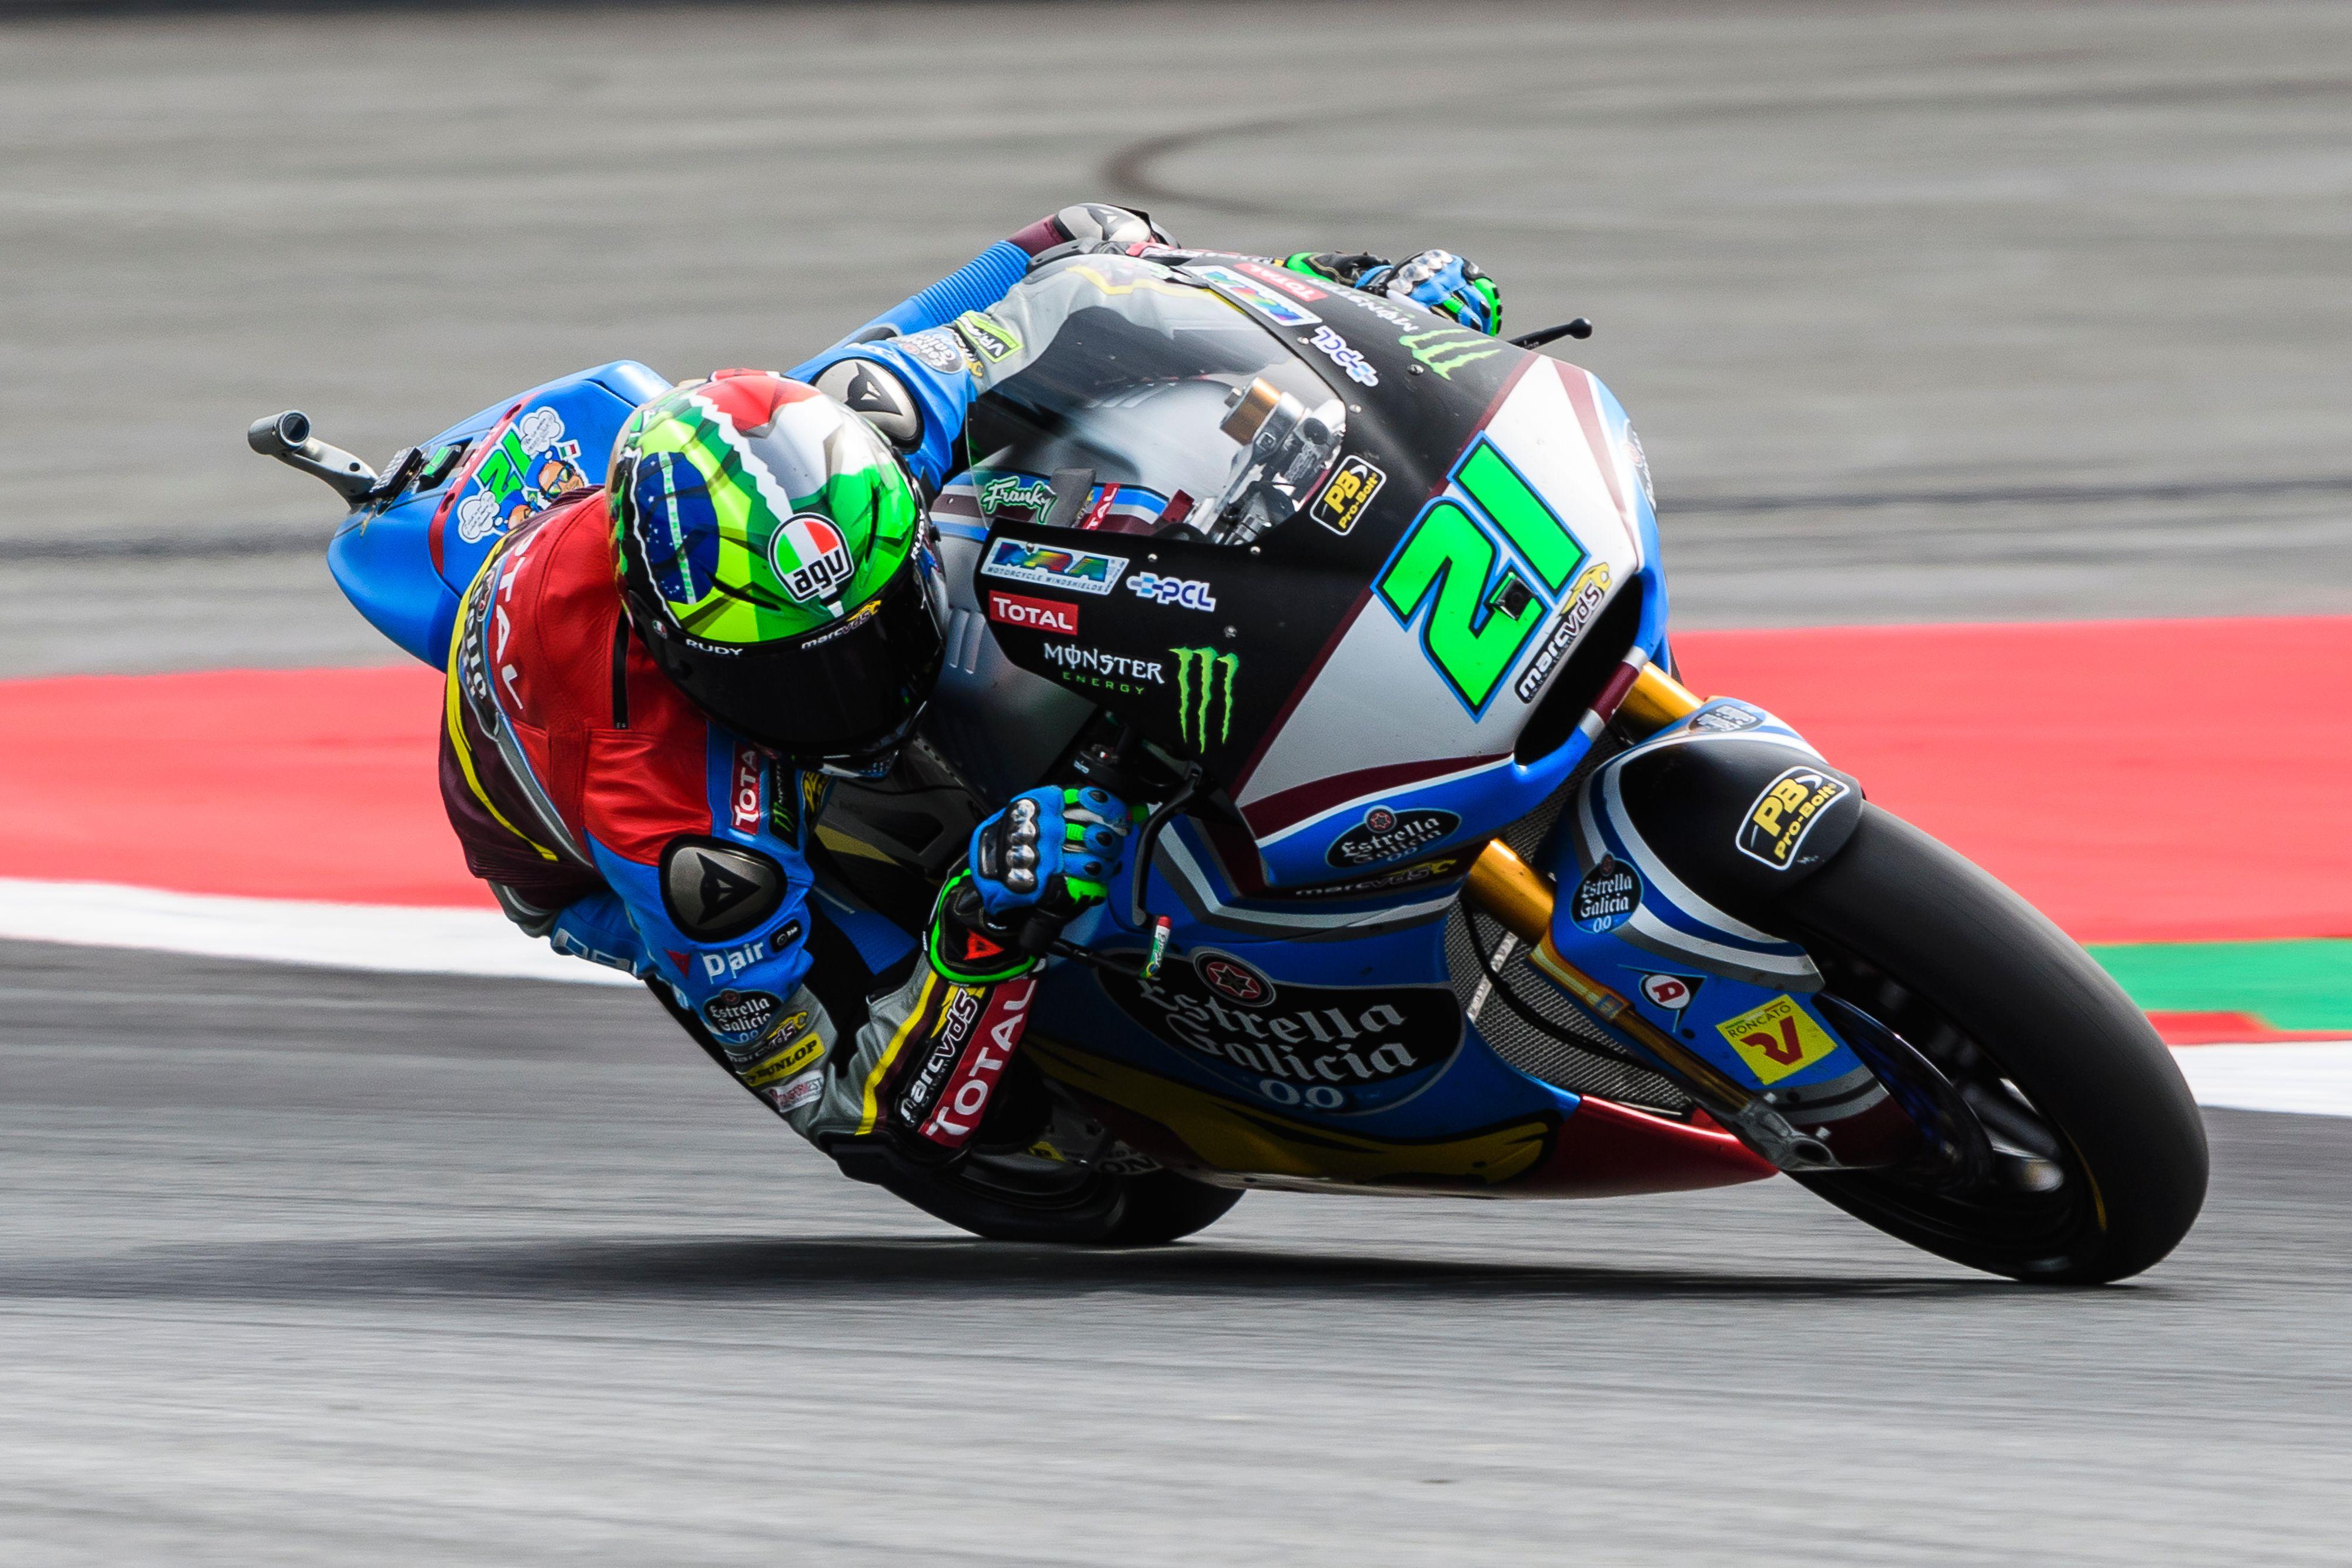 Morbidelli sigue reinando en Moto2